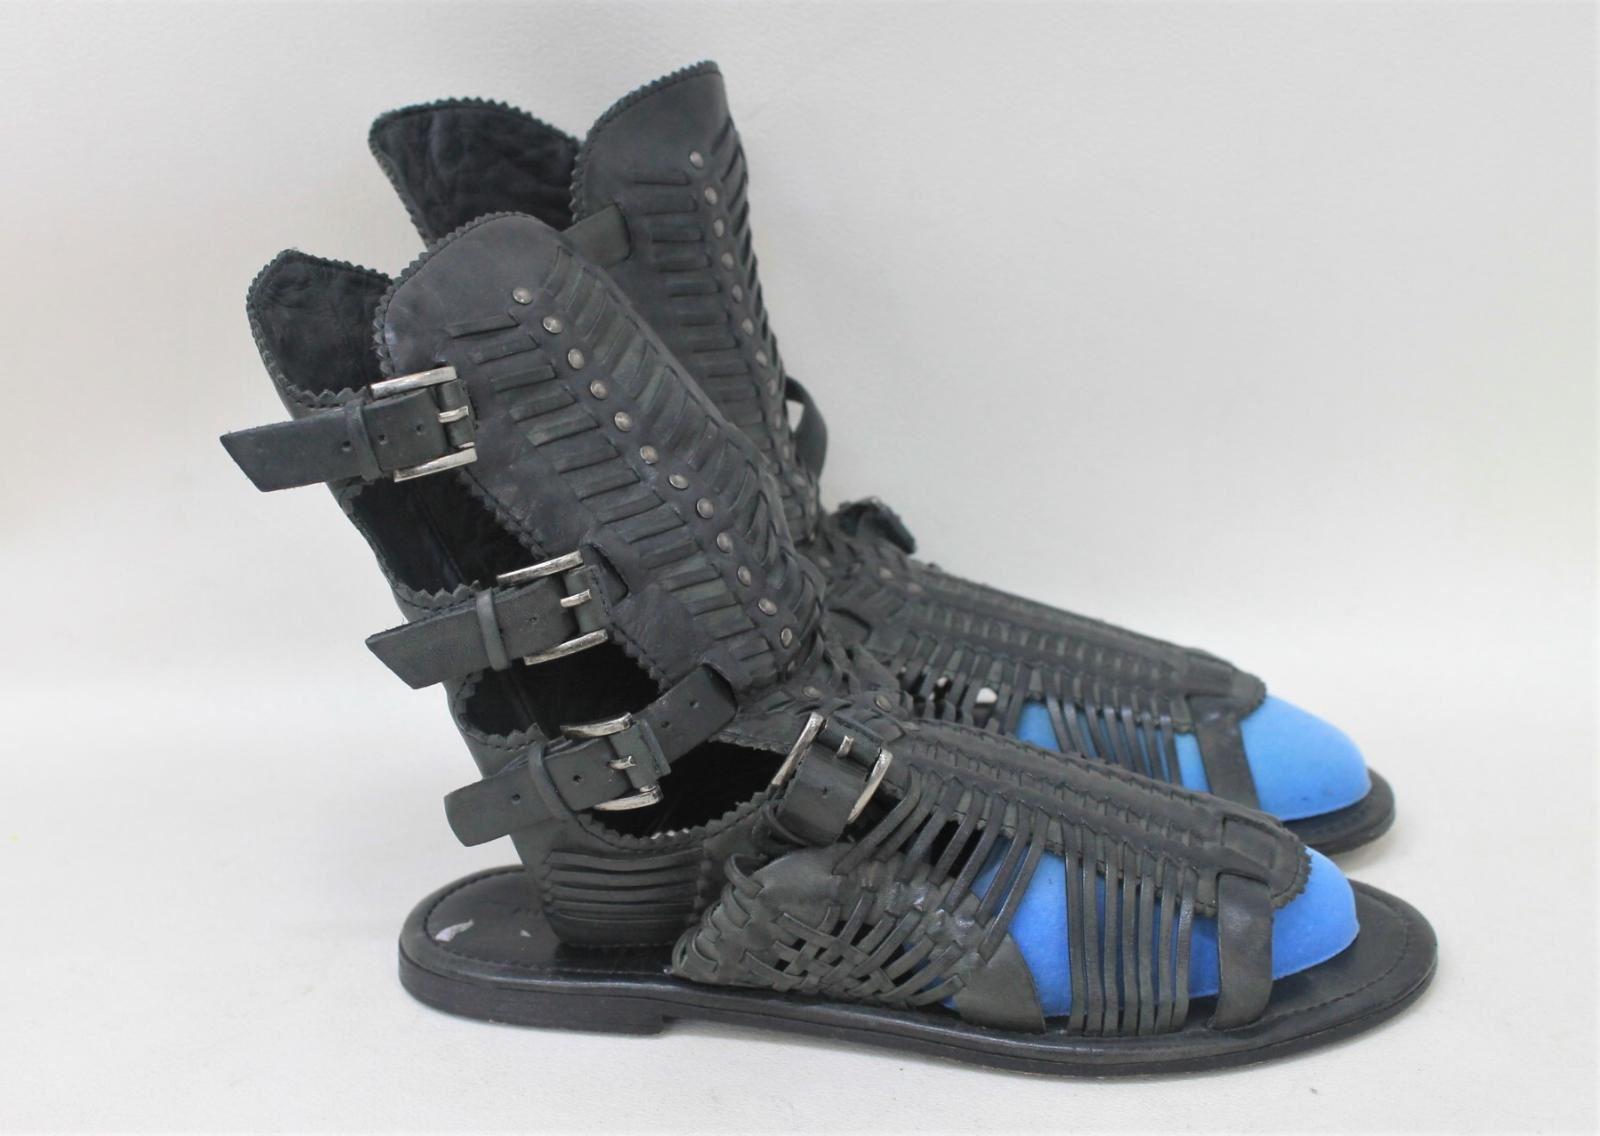 ALL-SAINTS-Ladies-Jacks-Place-Black-Woven-Leather-Gladiator-Sandals-UK5-EU38